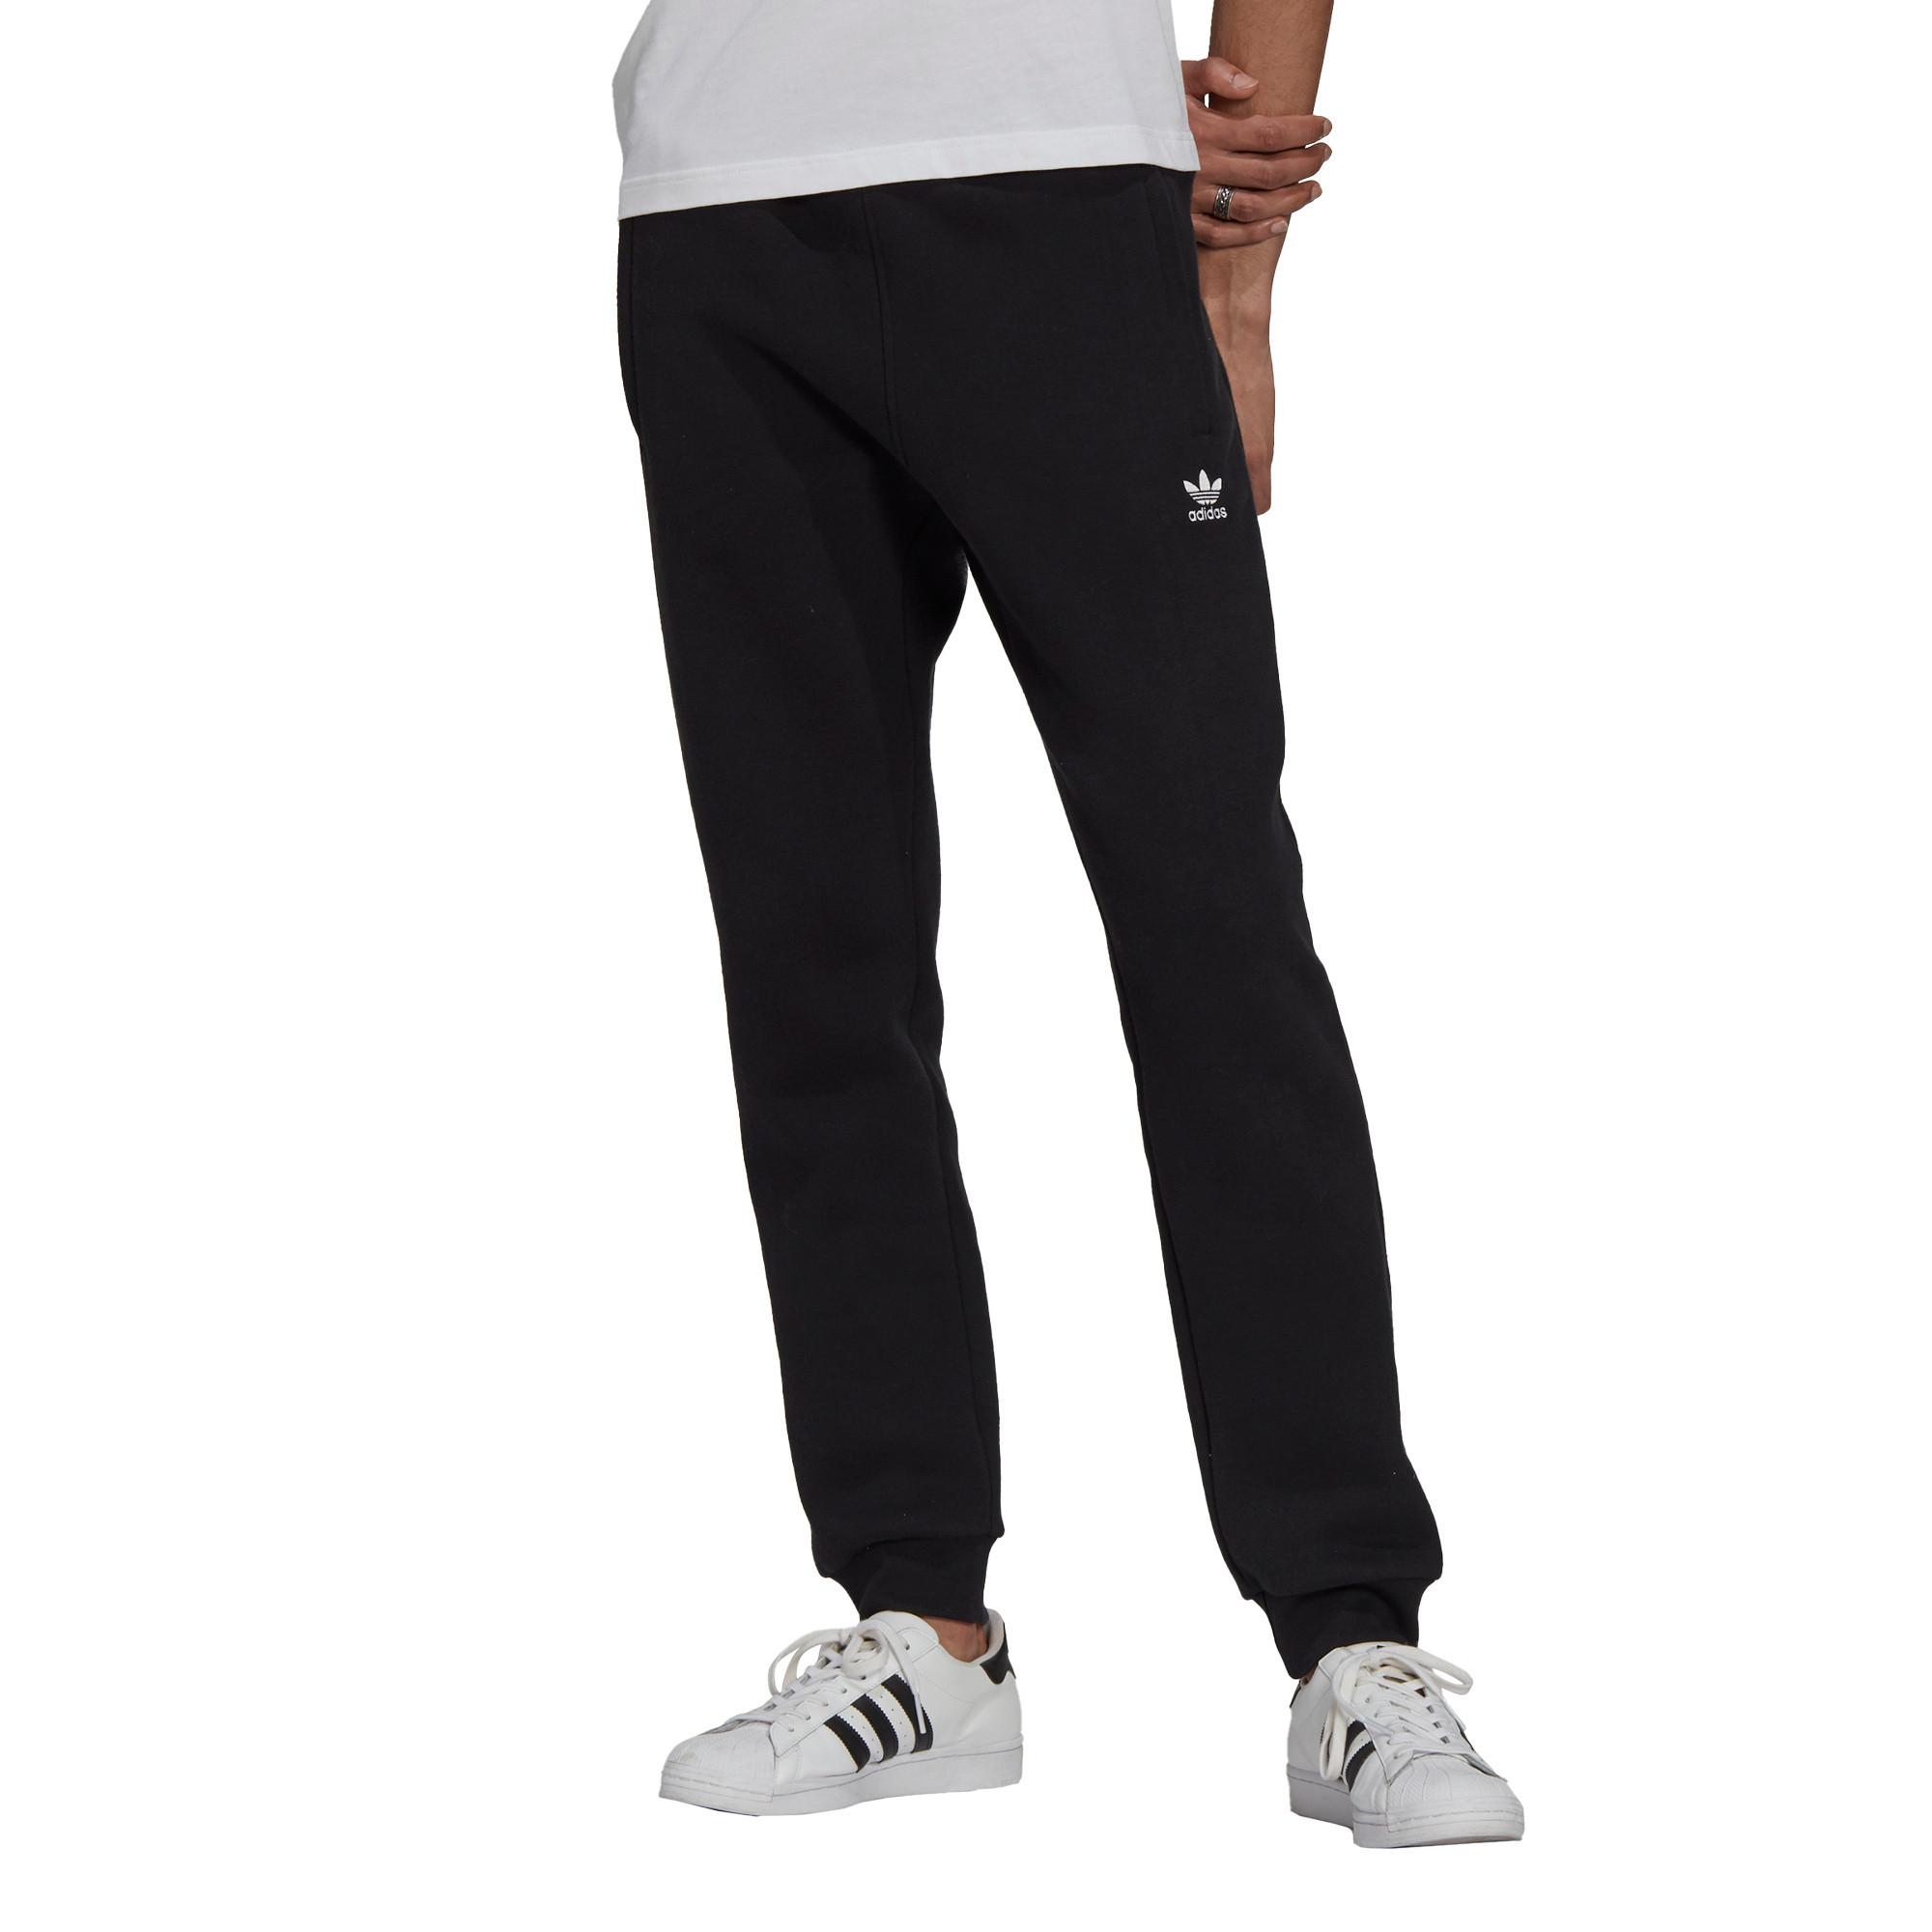 Pantaloni adicolor Essentials Trefoil, Nero, large image number 2